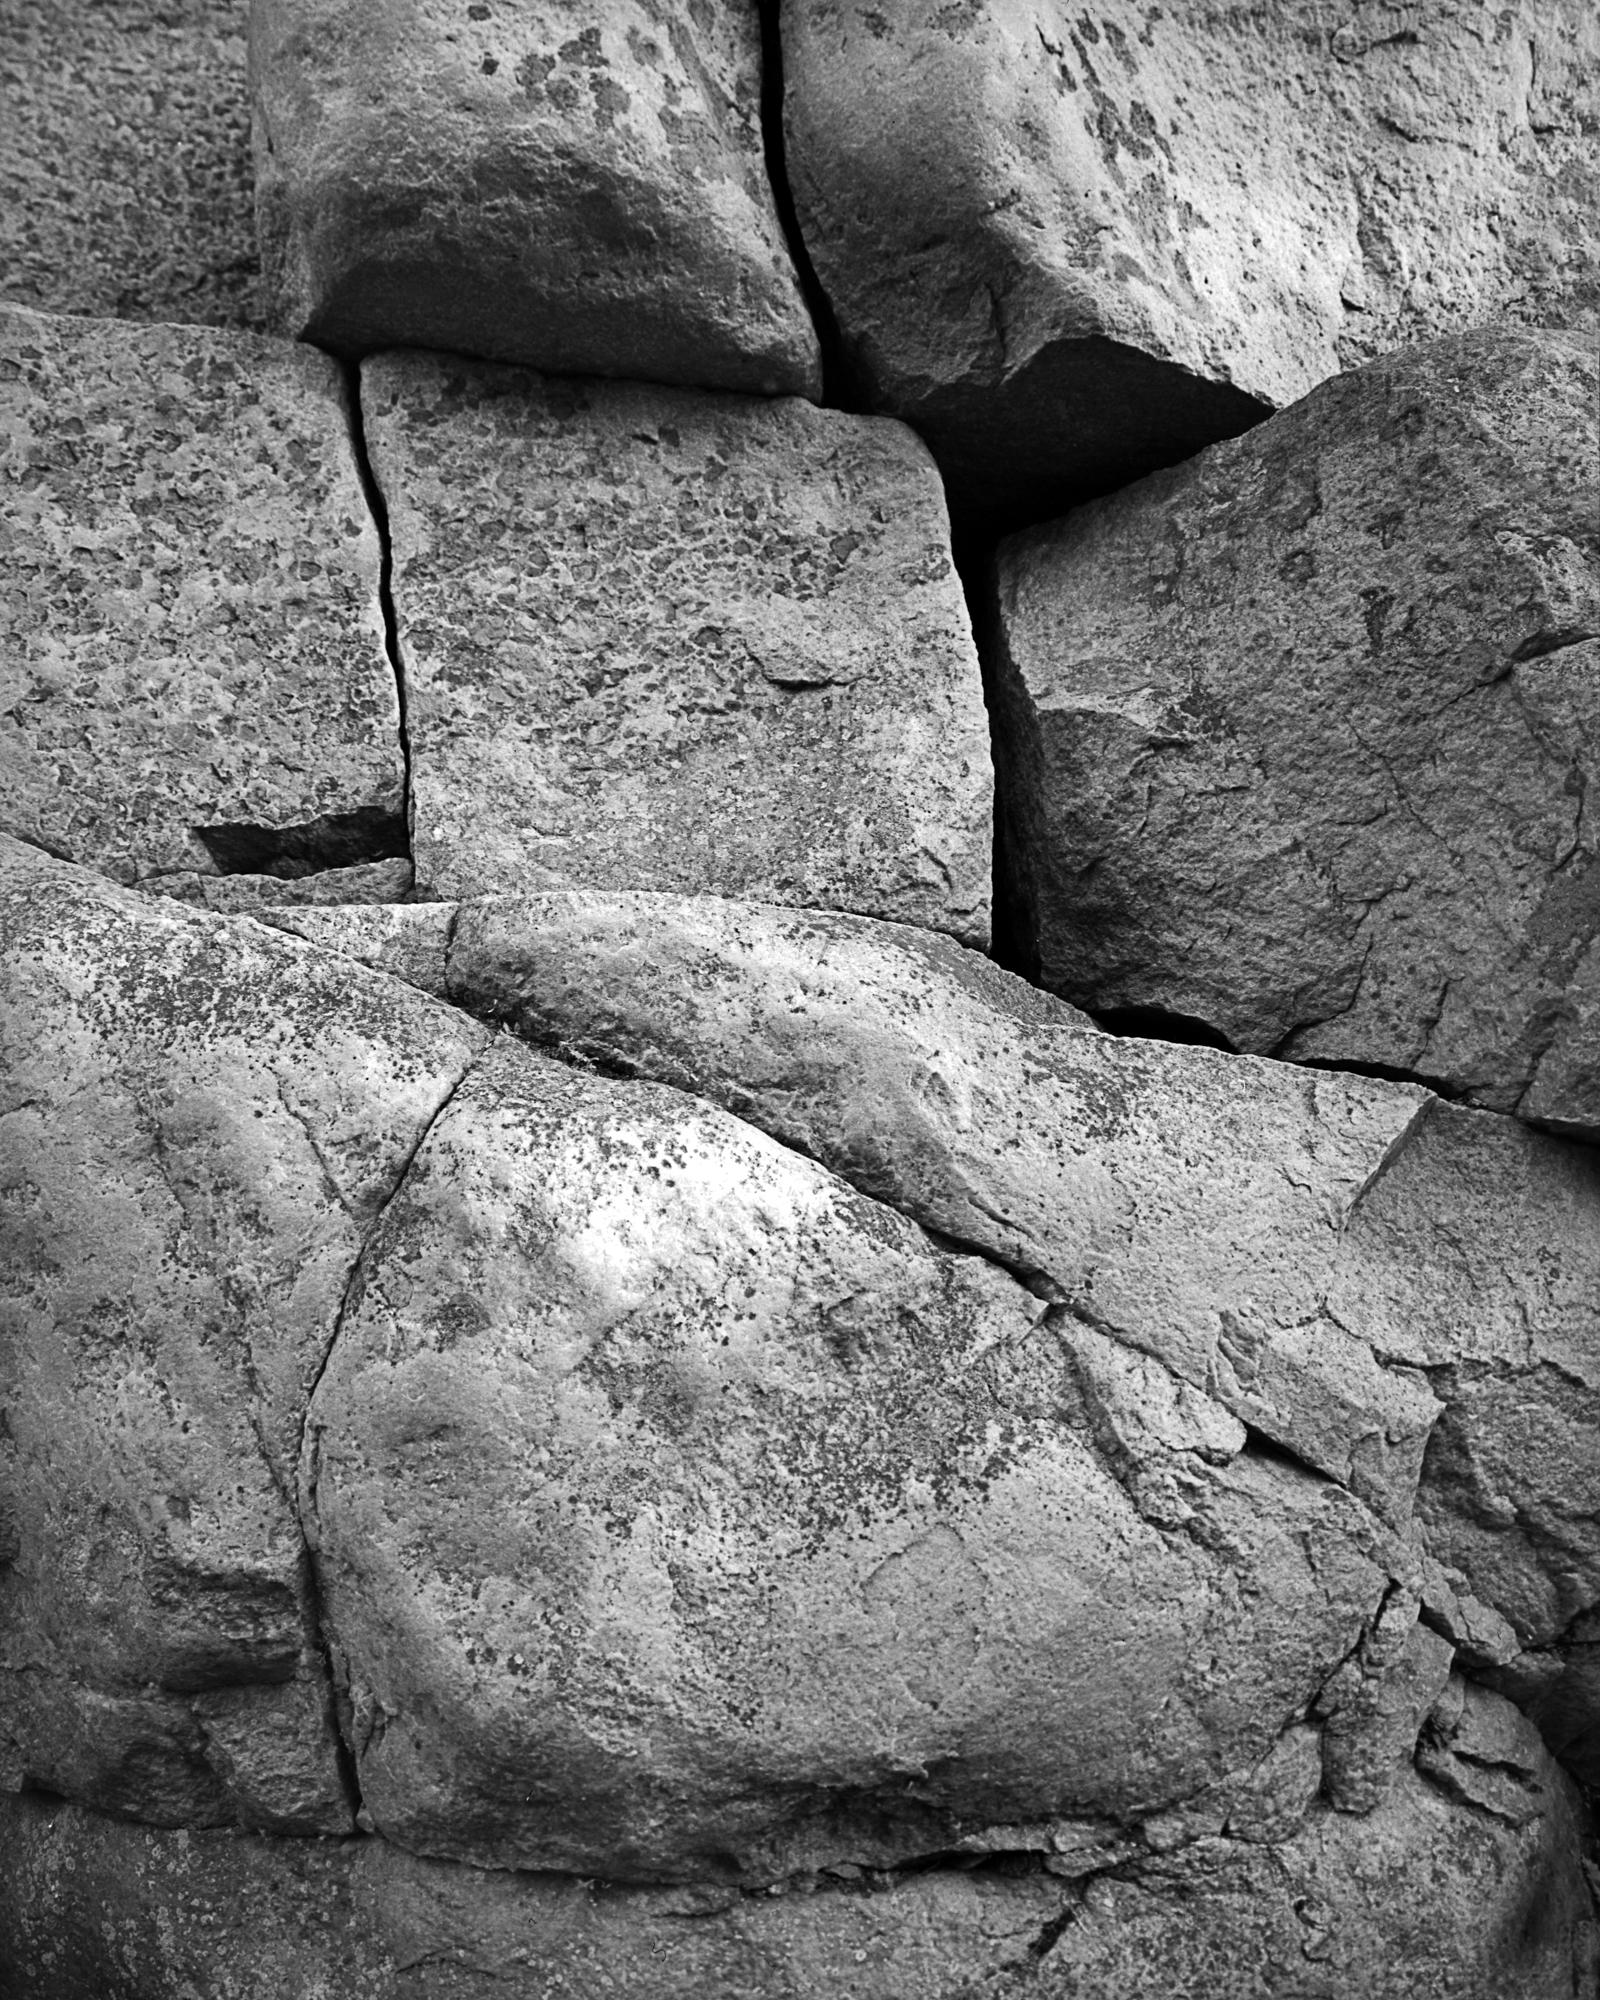 Rib Mountain granite formation